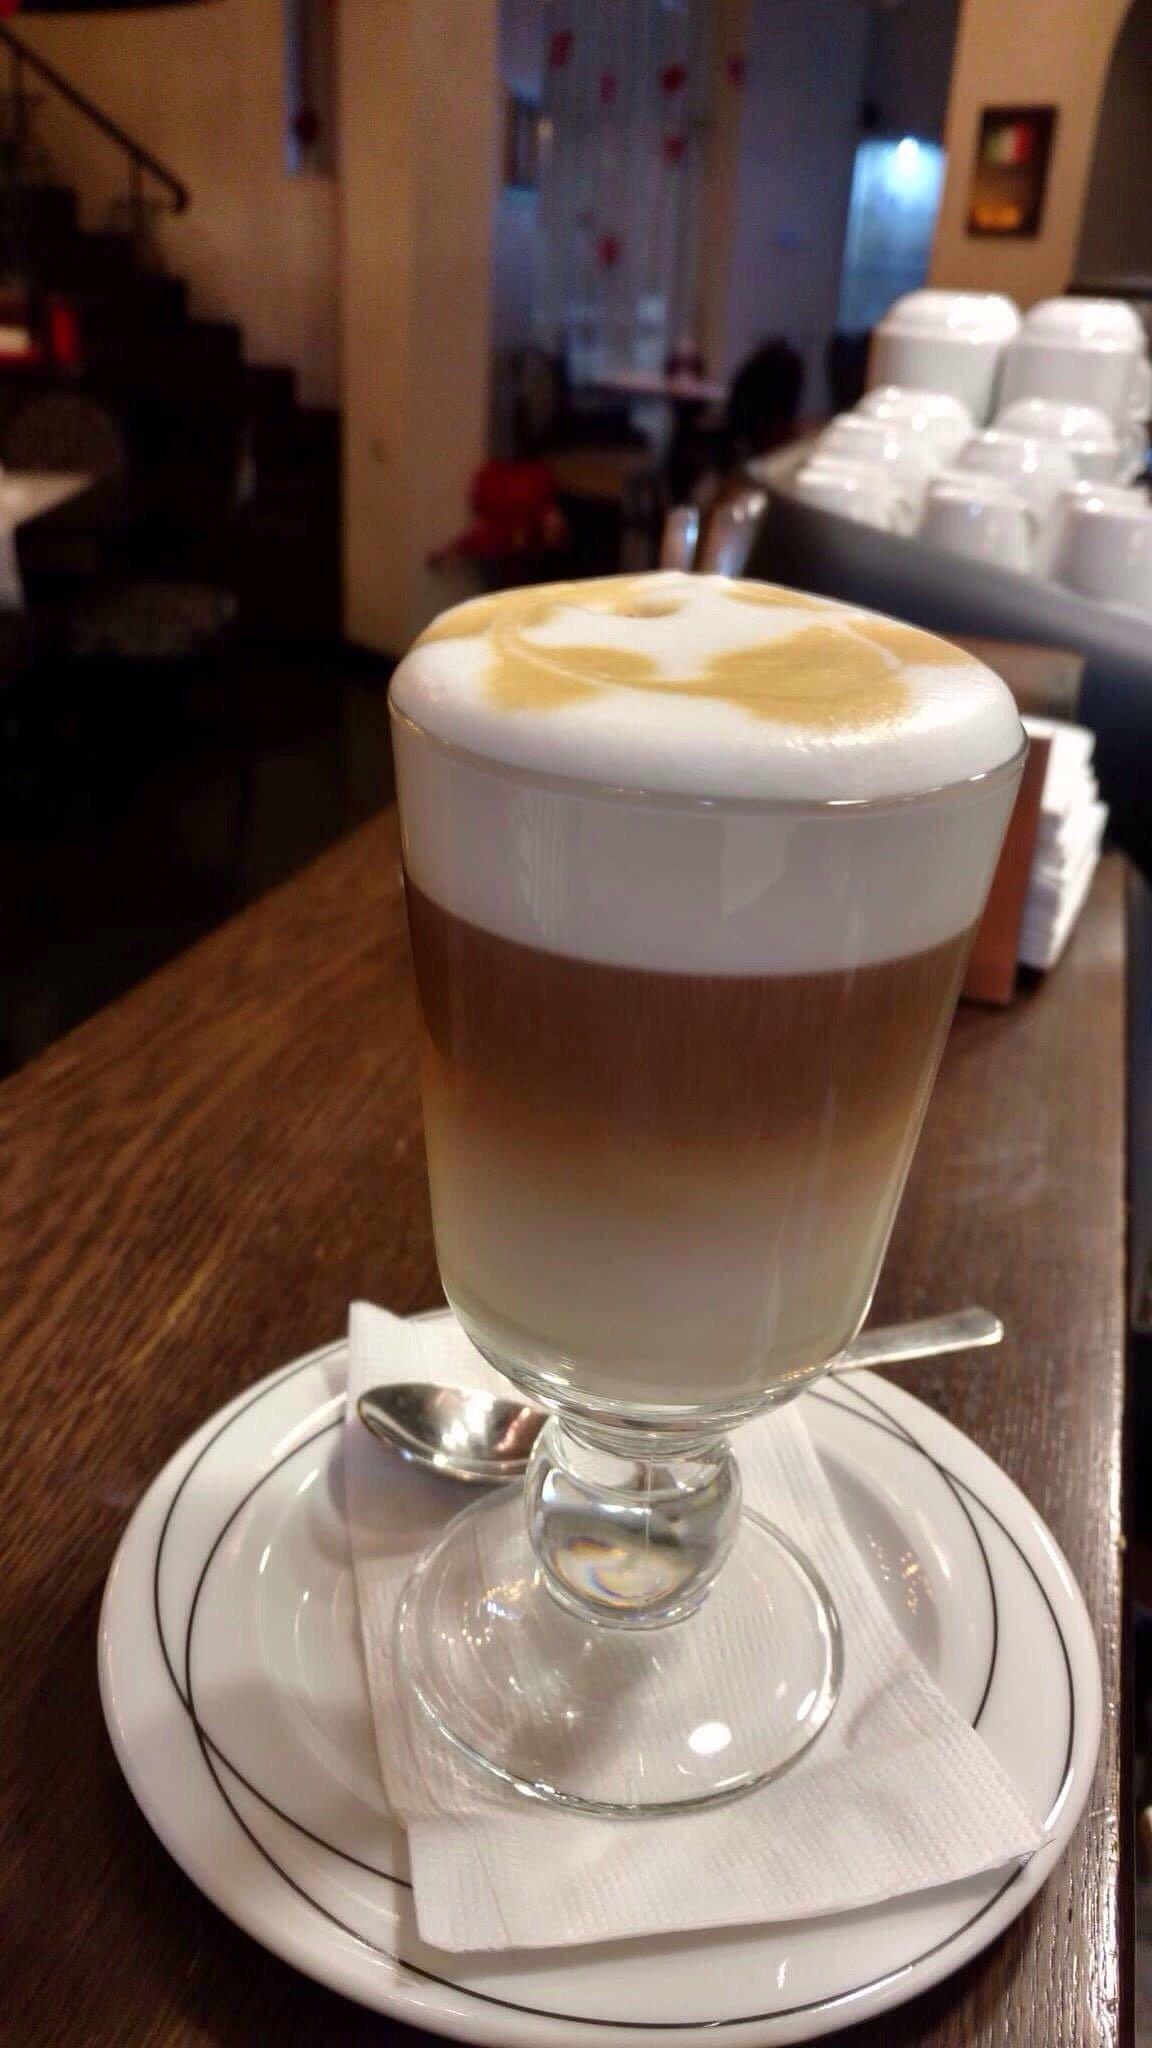 Patio Yerevan Restaurant Reviews & s TripAdvisor